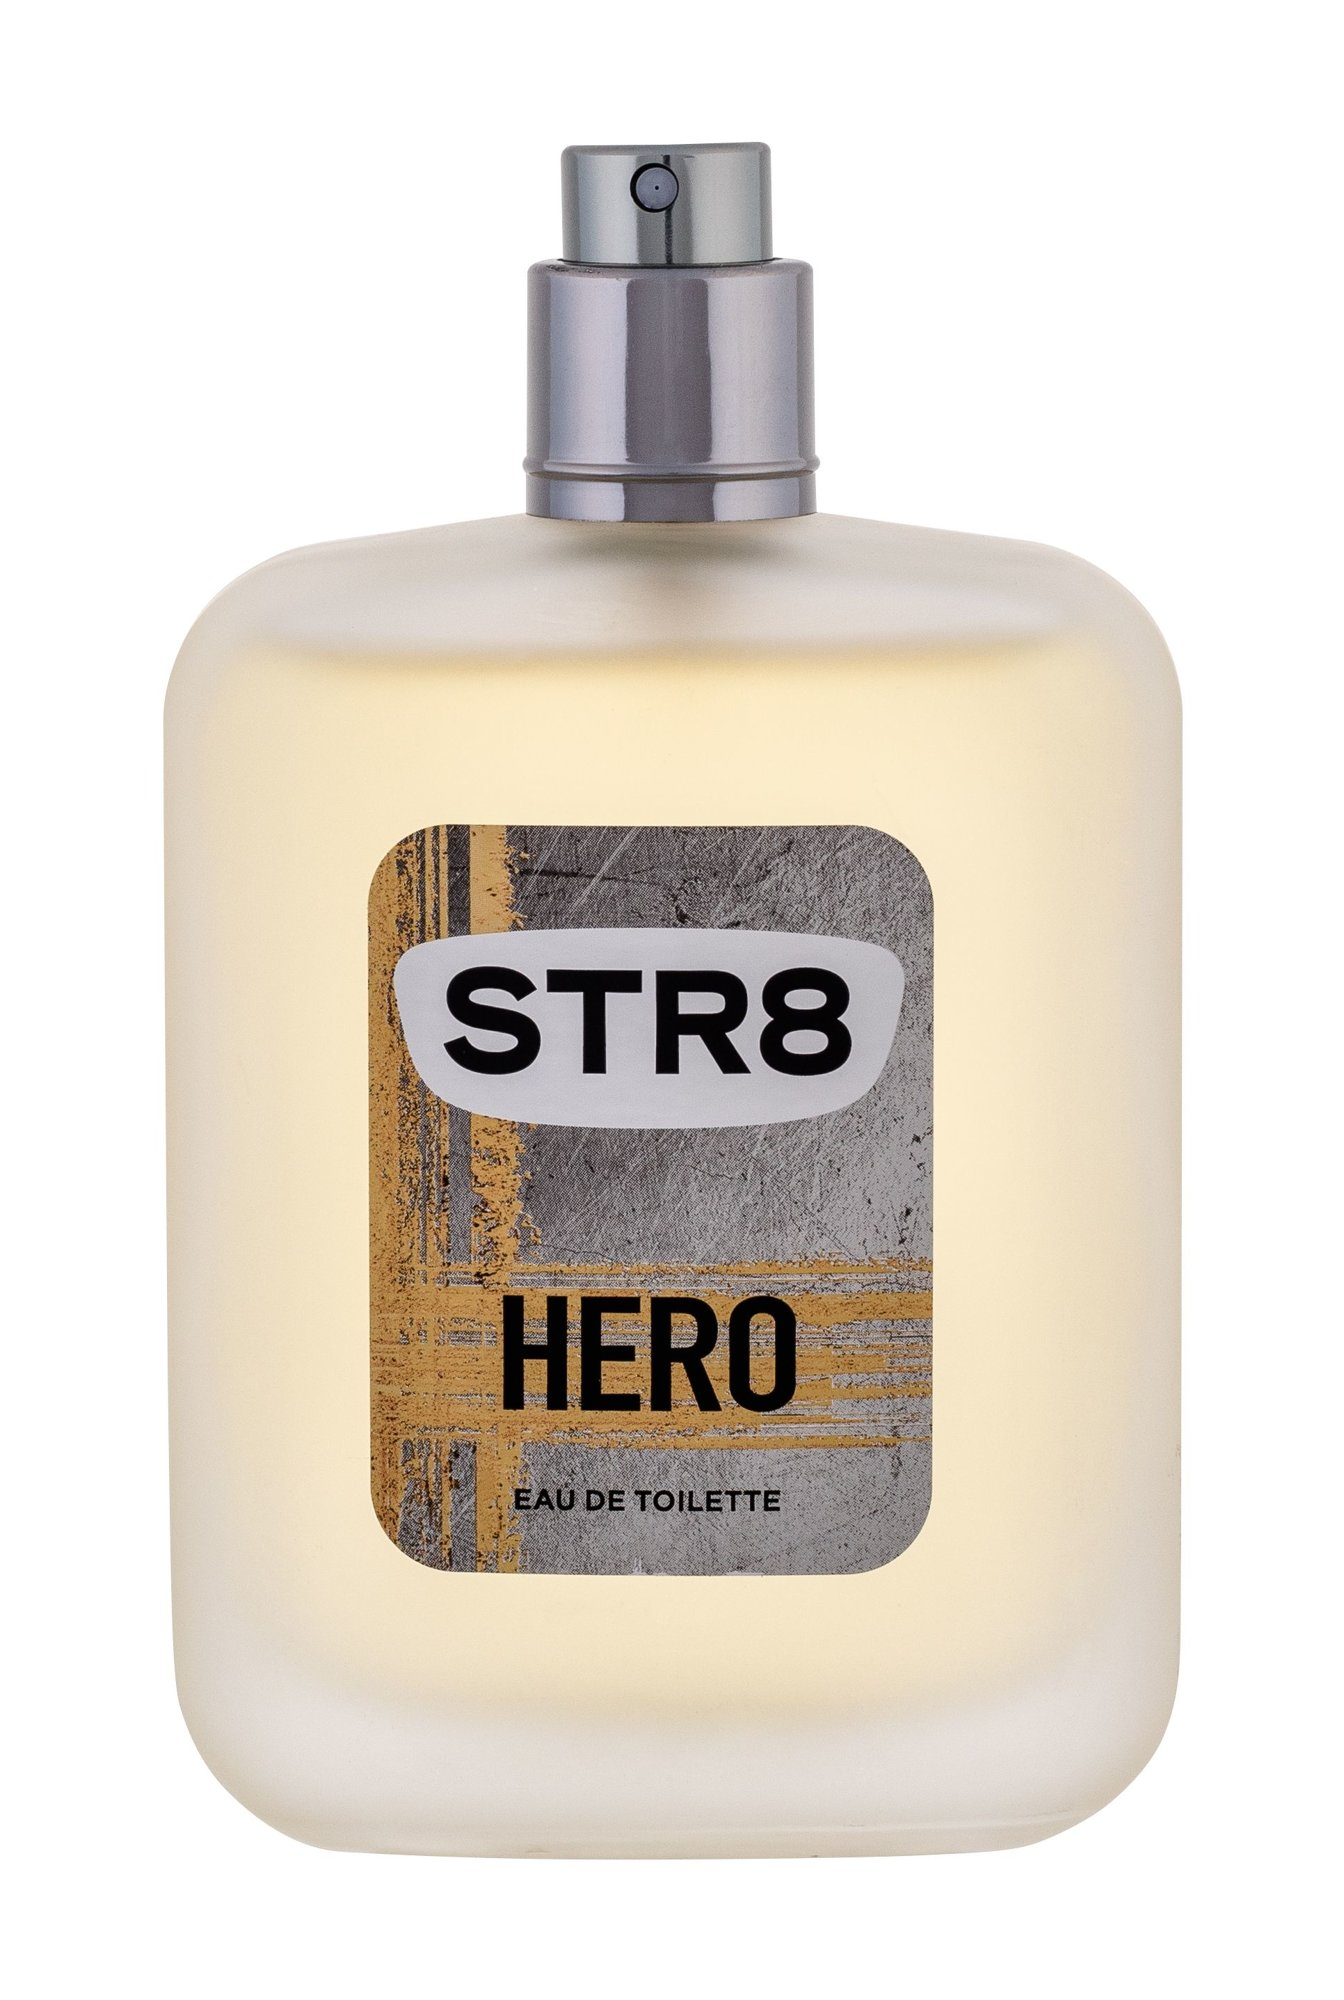 STR8 Hero Eau de Toilette 100ml